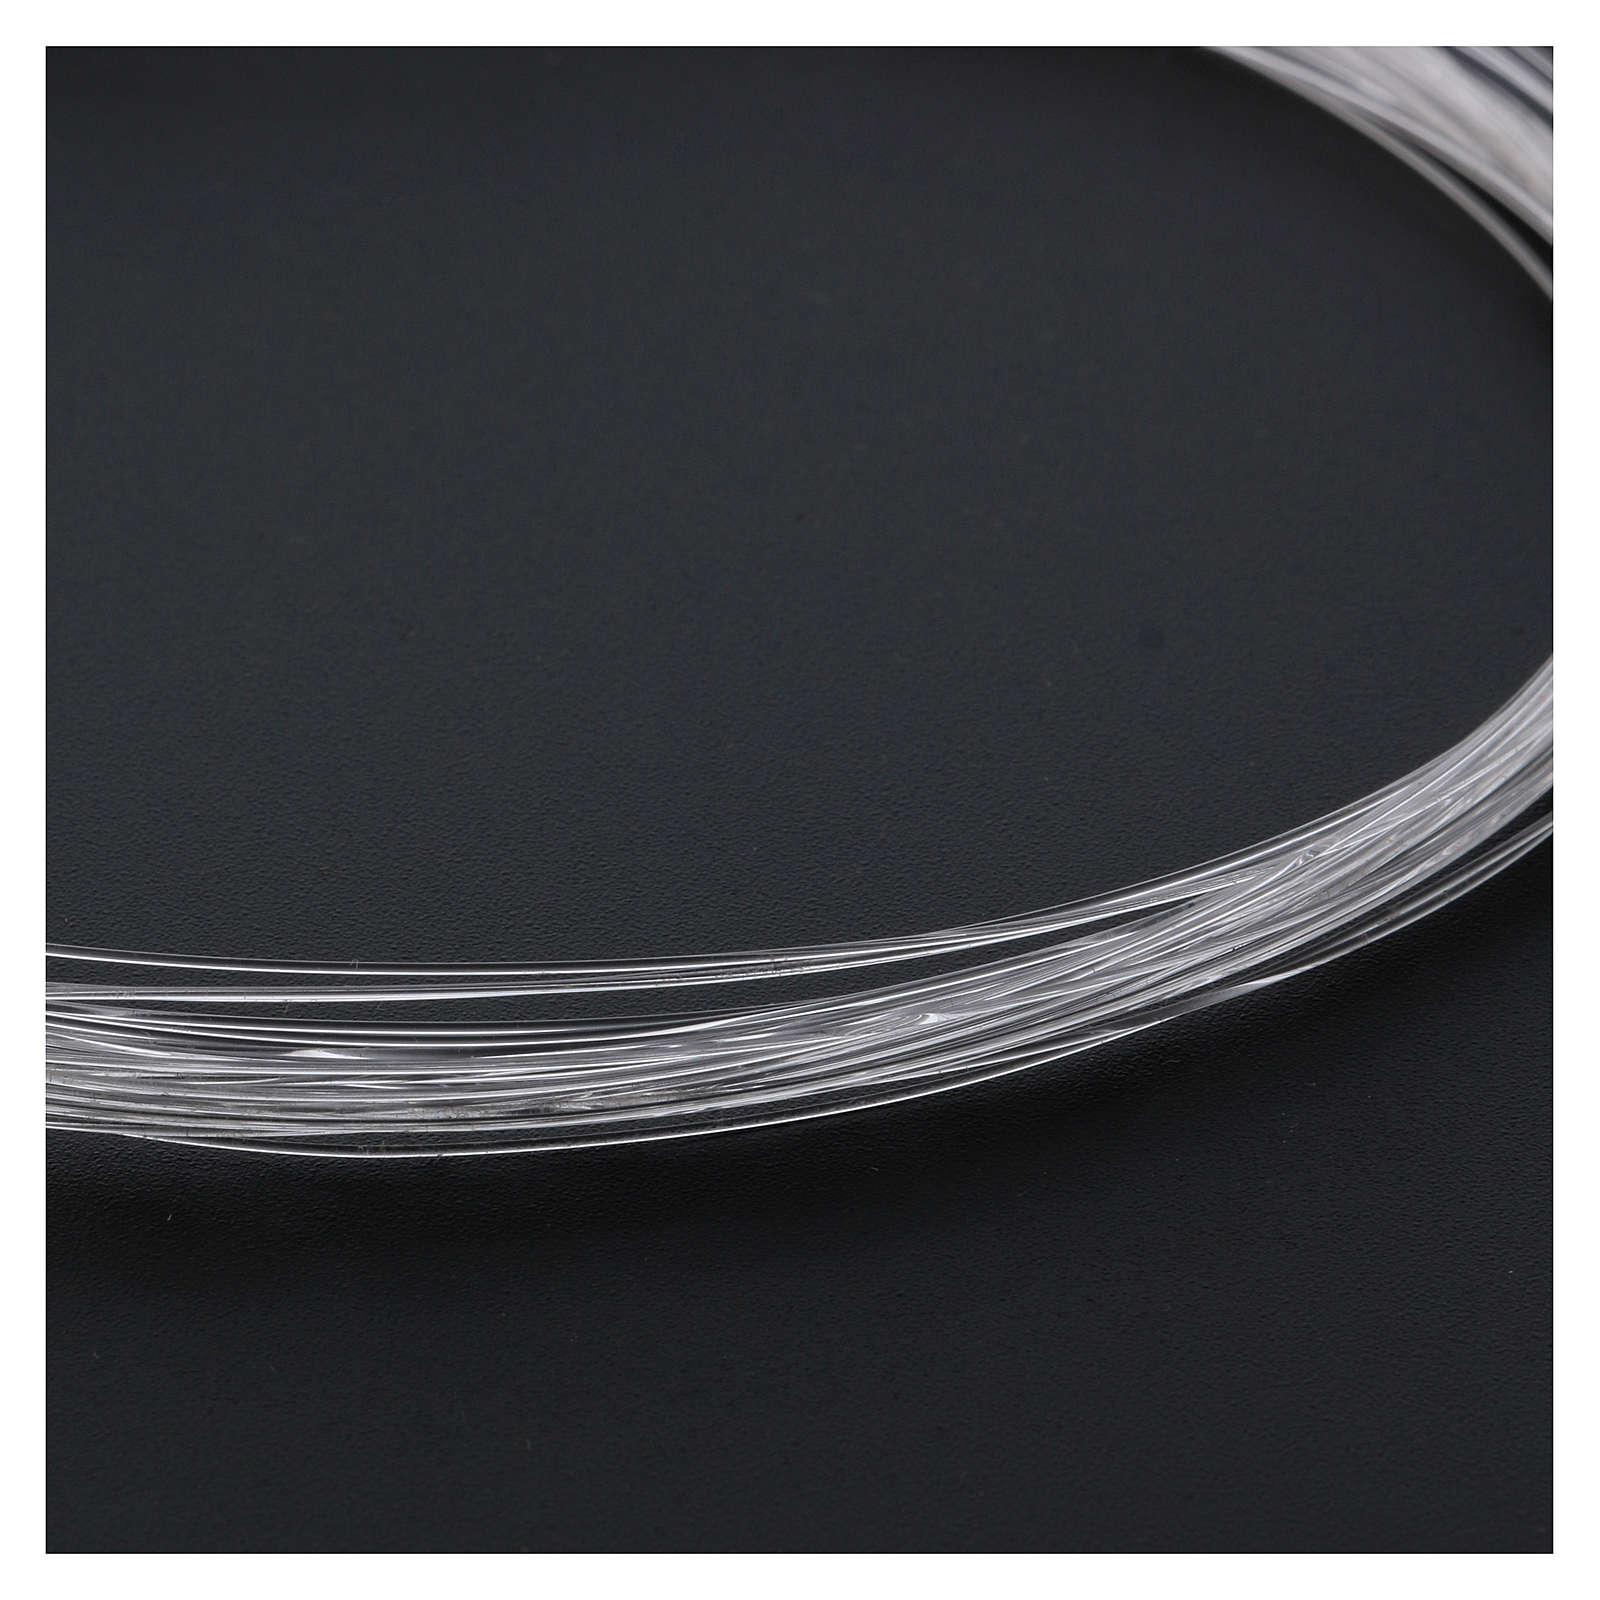 Bobina fibra ottica 10 mt per presepe - diam 0,50 mm 4